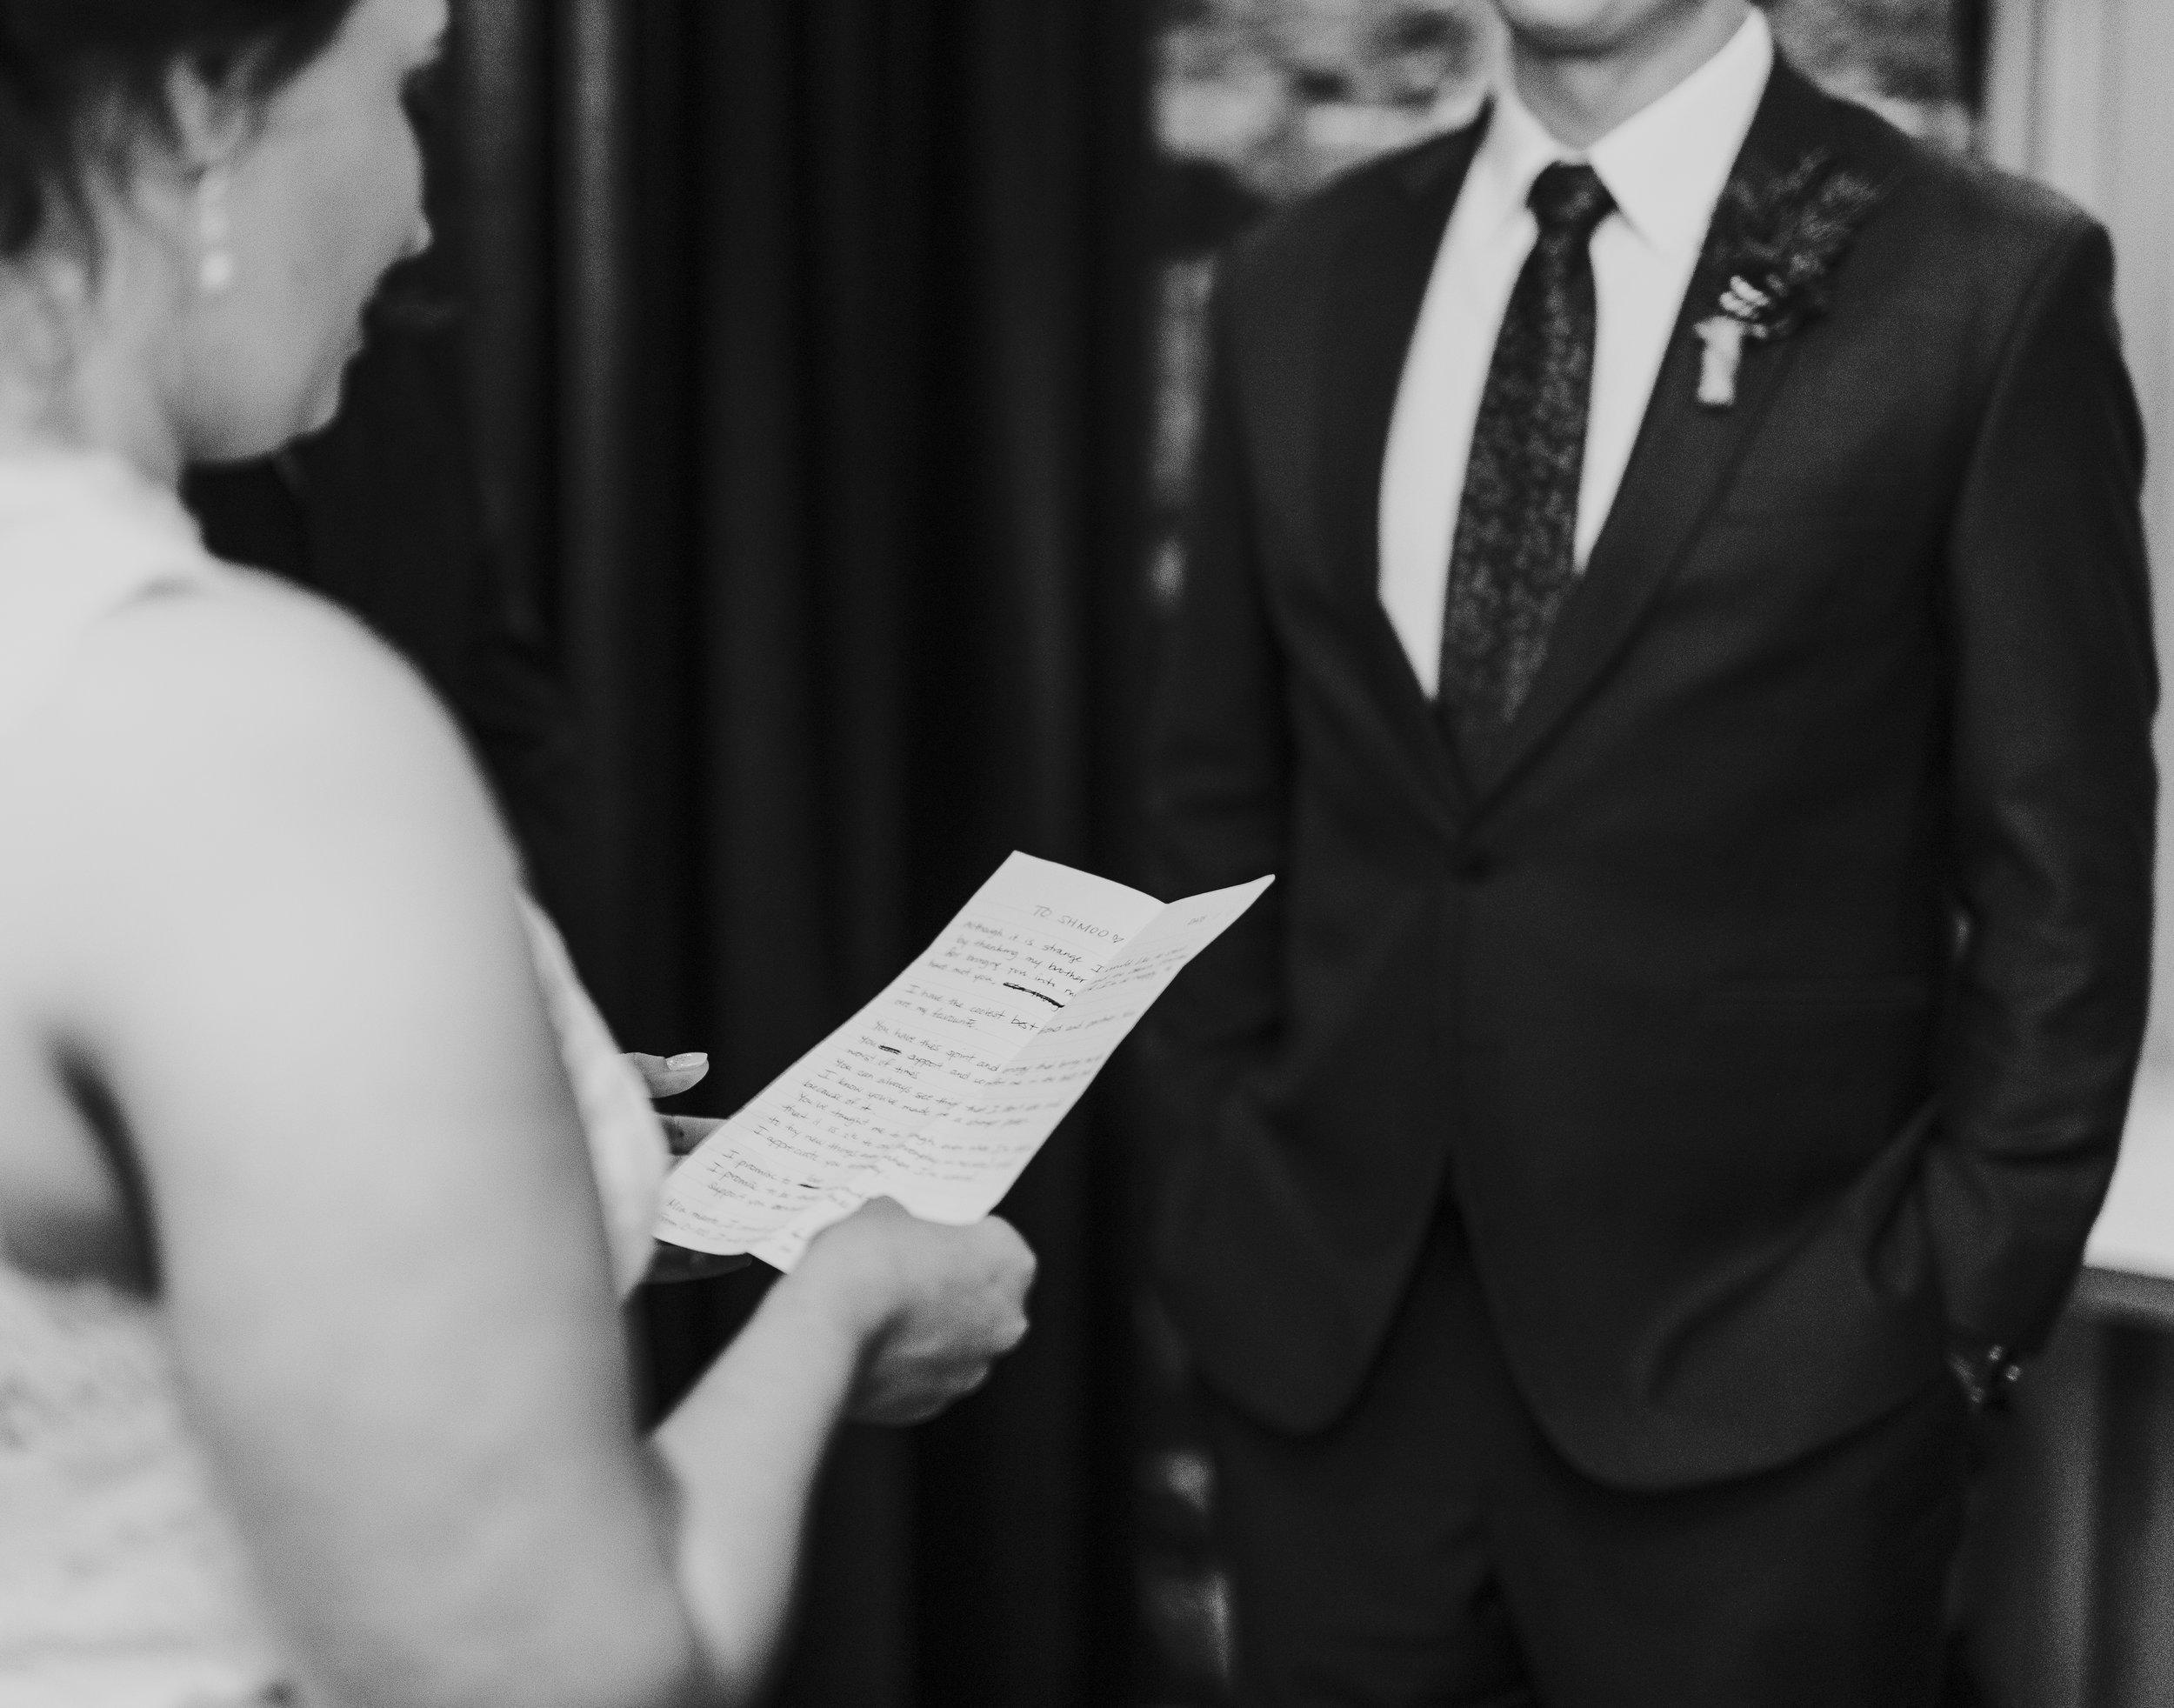 003_Ceremony-008.jpg